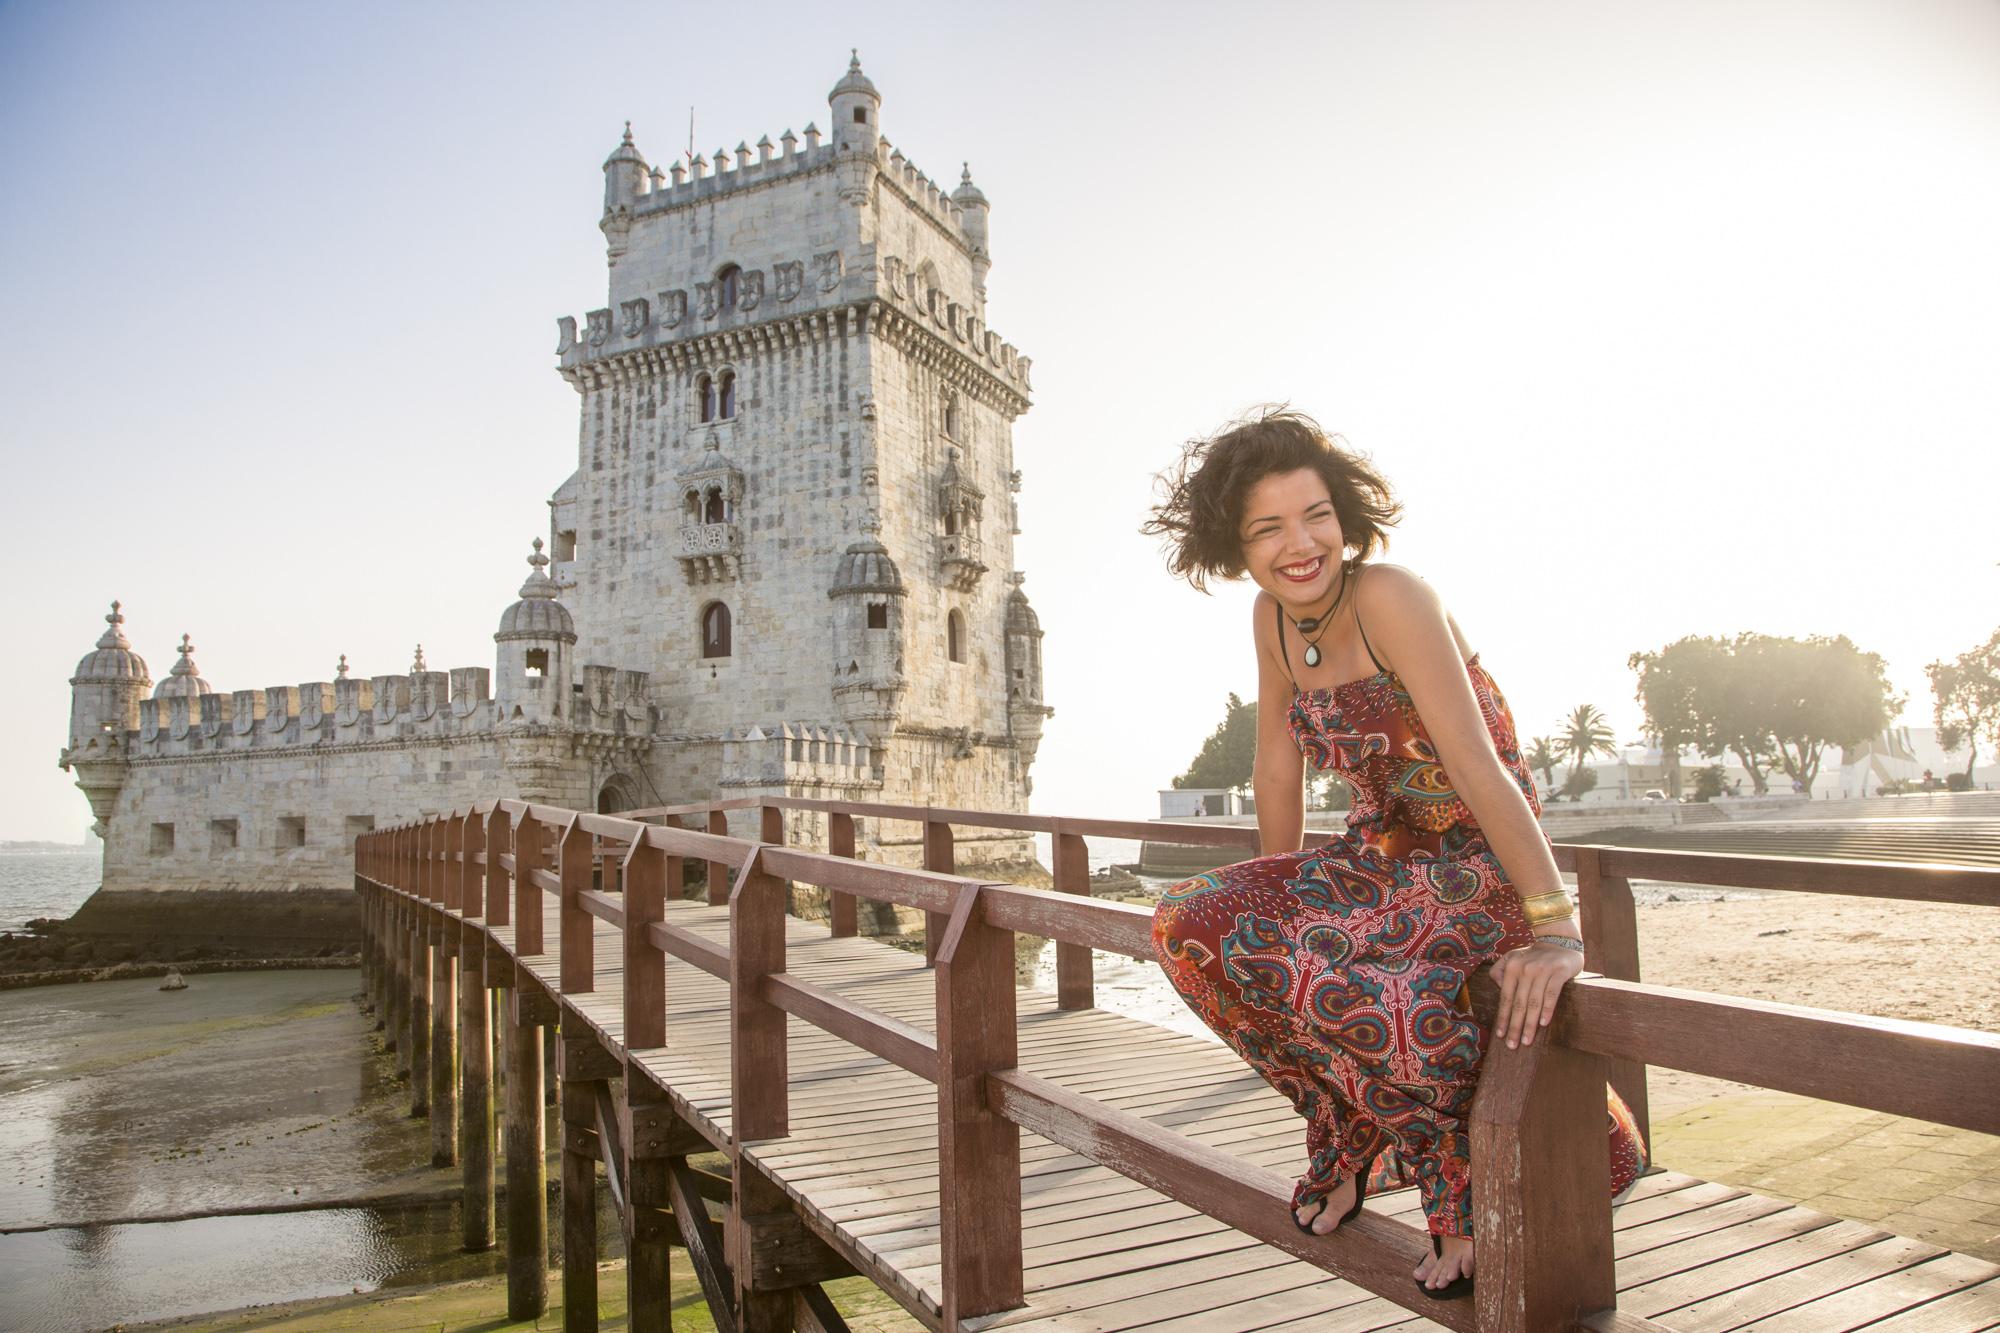 Portugal, Lissabon, Lissabon, Belem Viertel, Torre de Belém, Marta vor dem Turm von Belém, UNESCO Weltkulturerbe